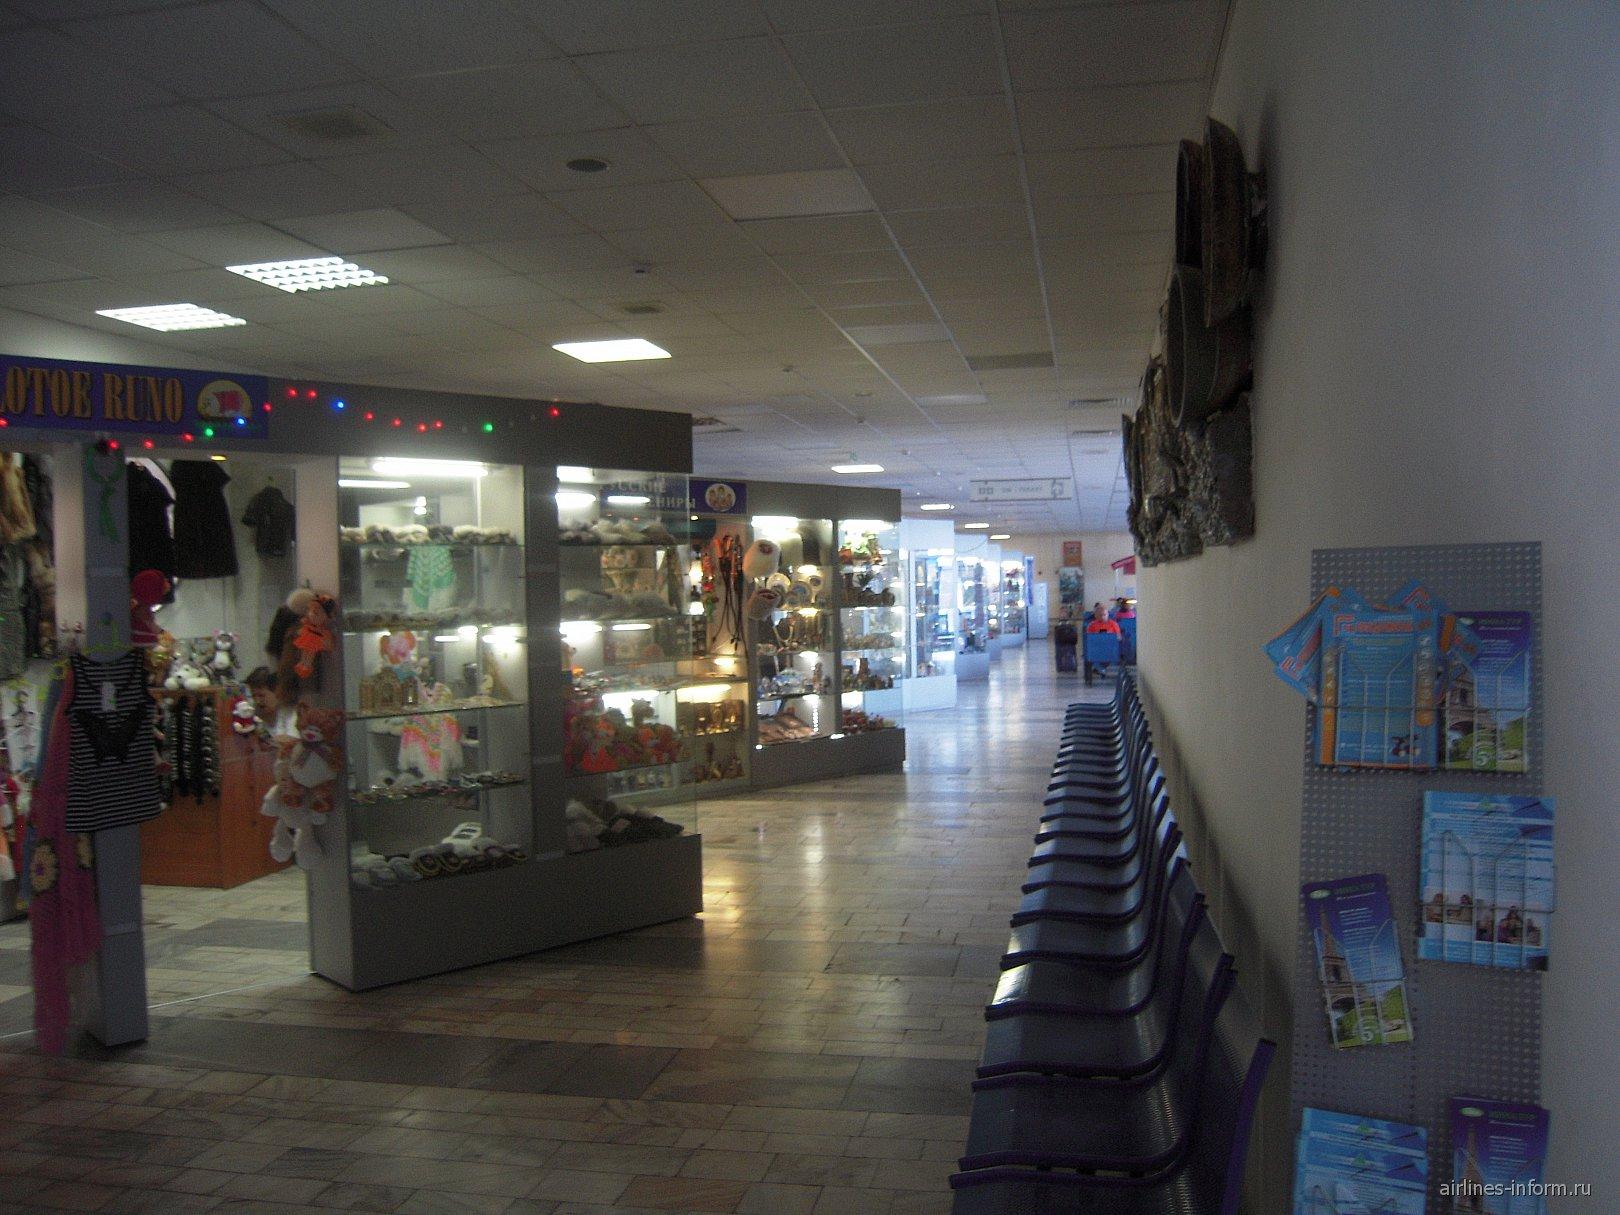 В аэропорту Ростова-на-Дону